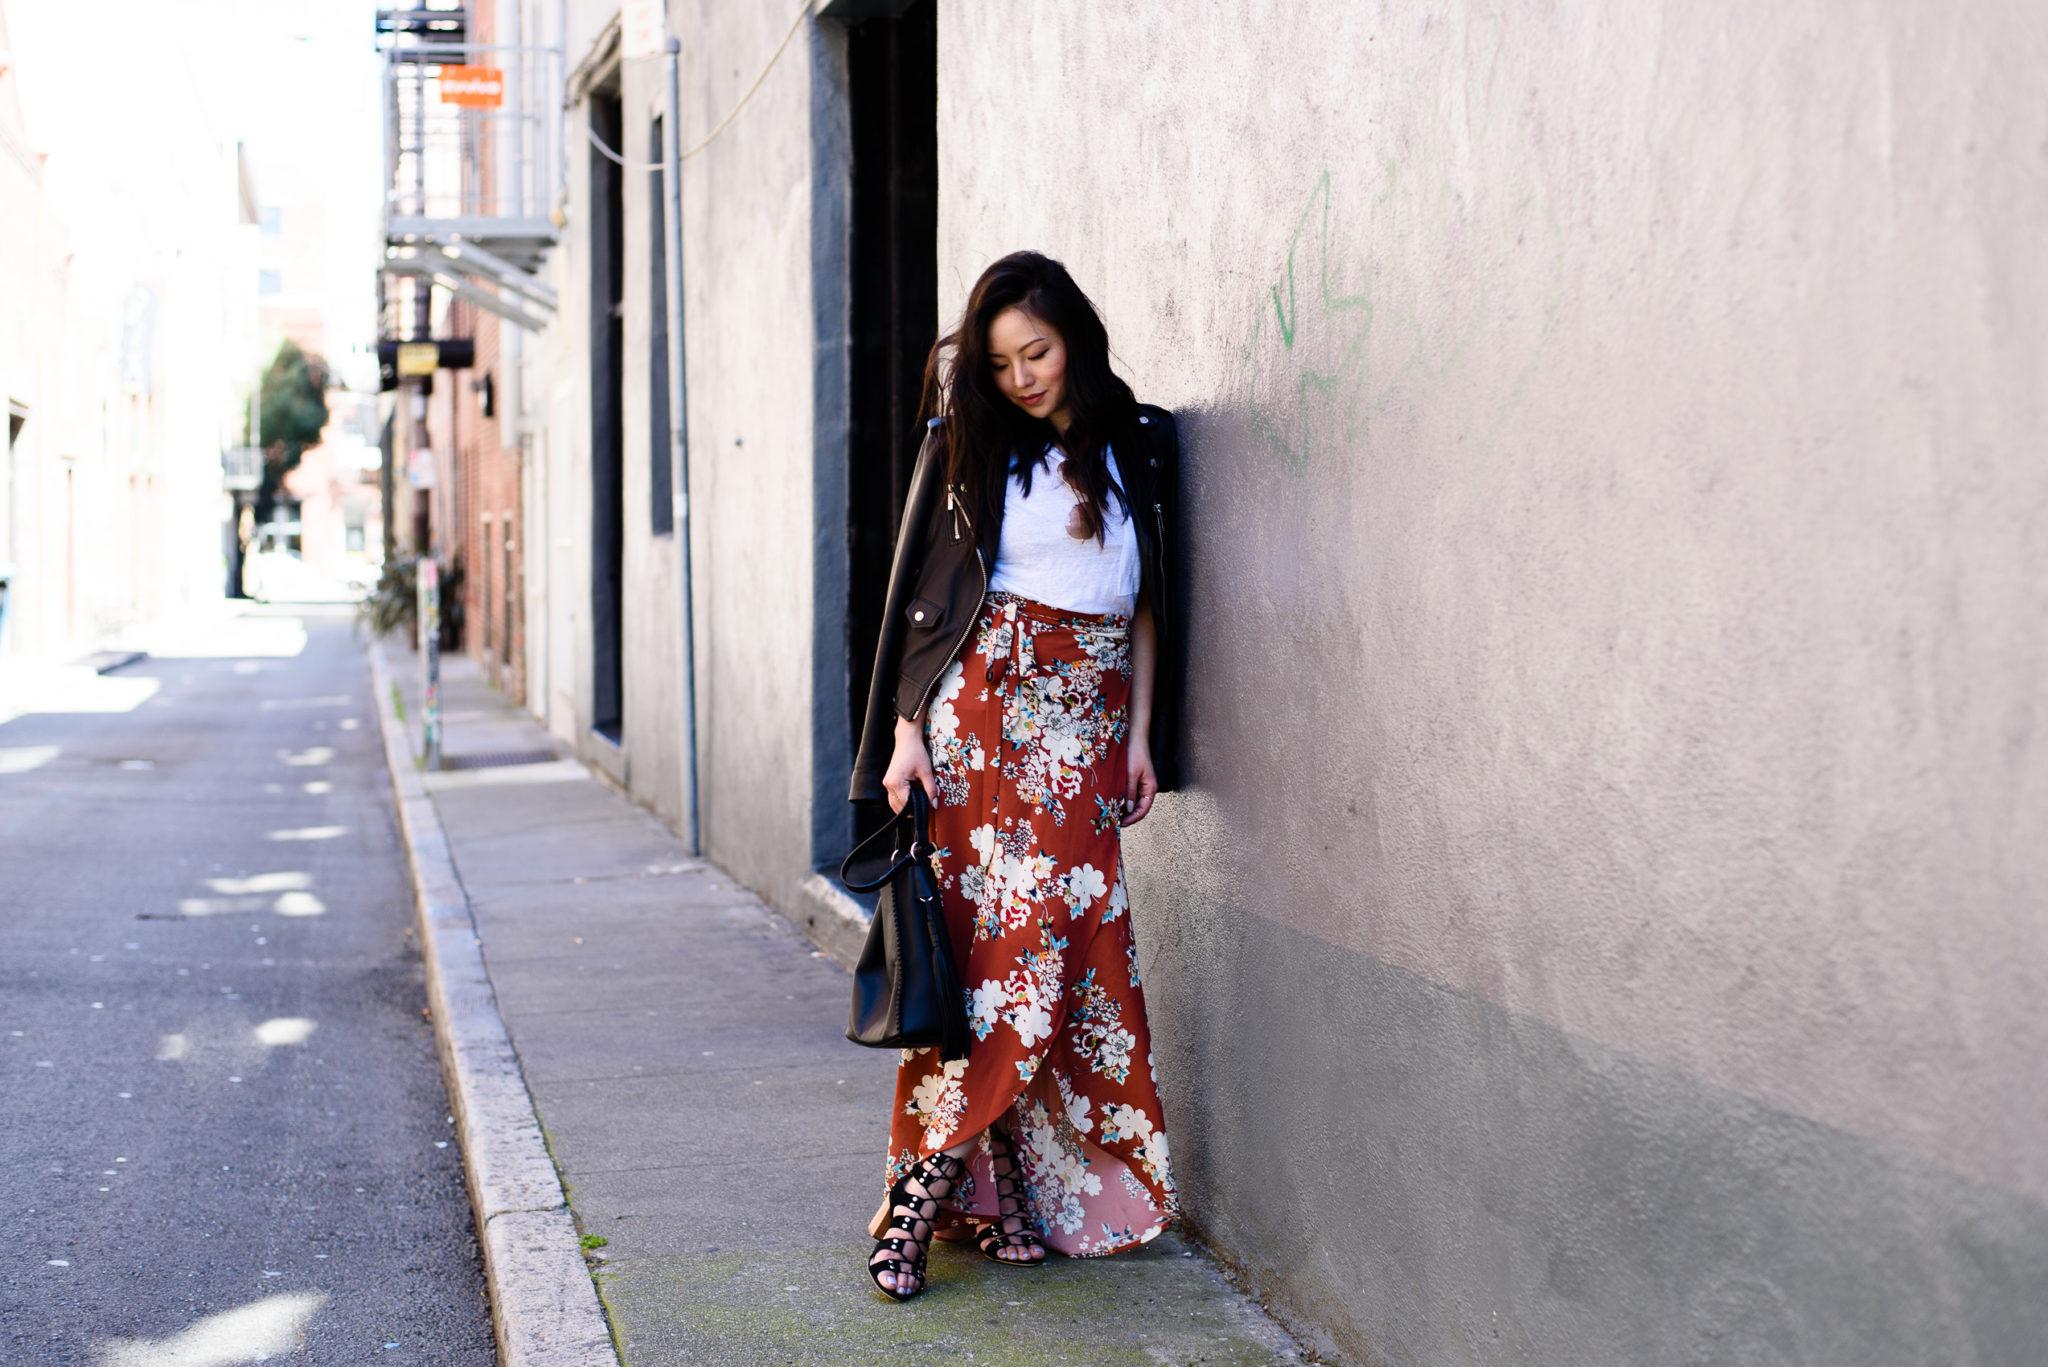 #OOTD: Flowy Skirt